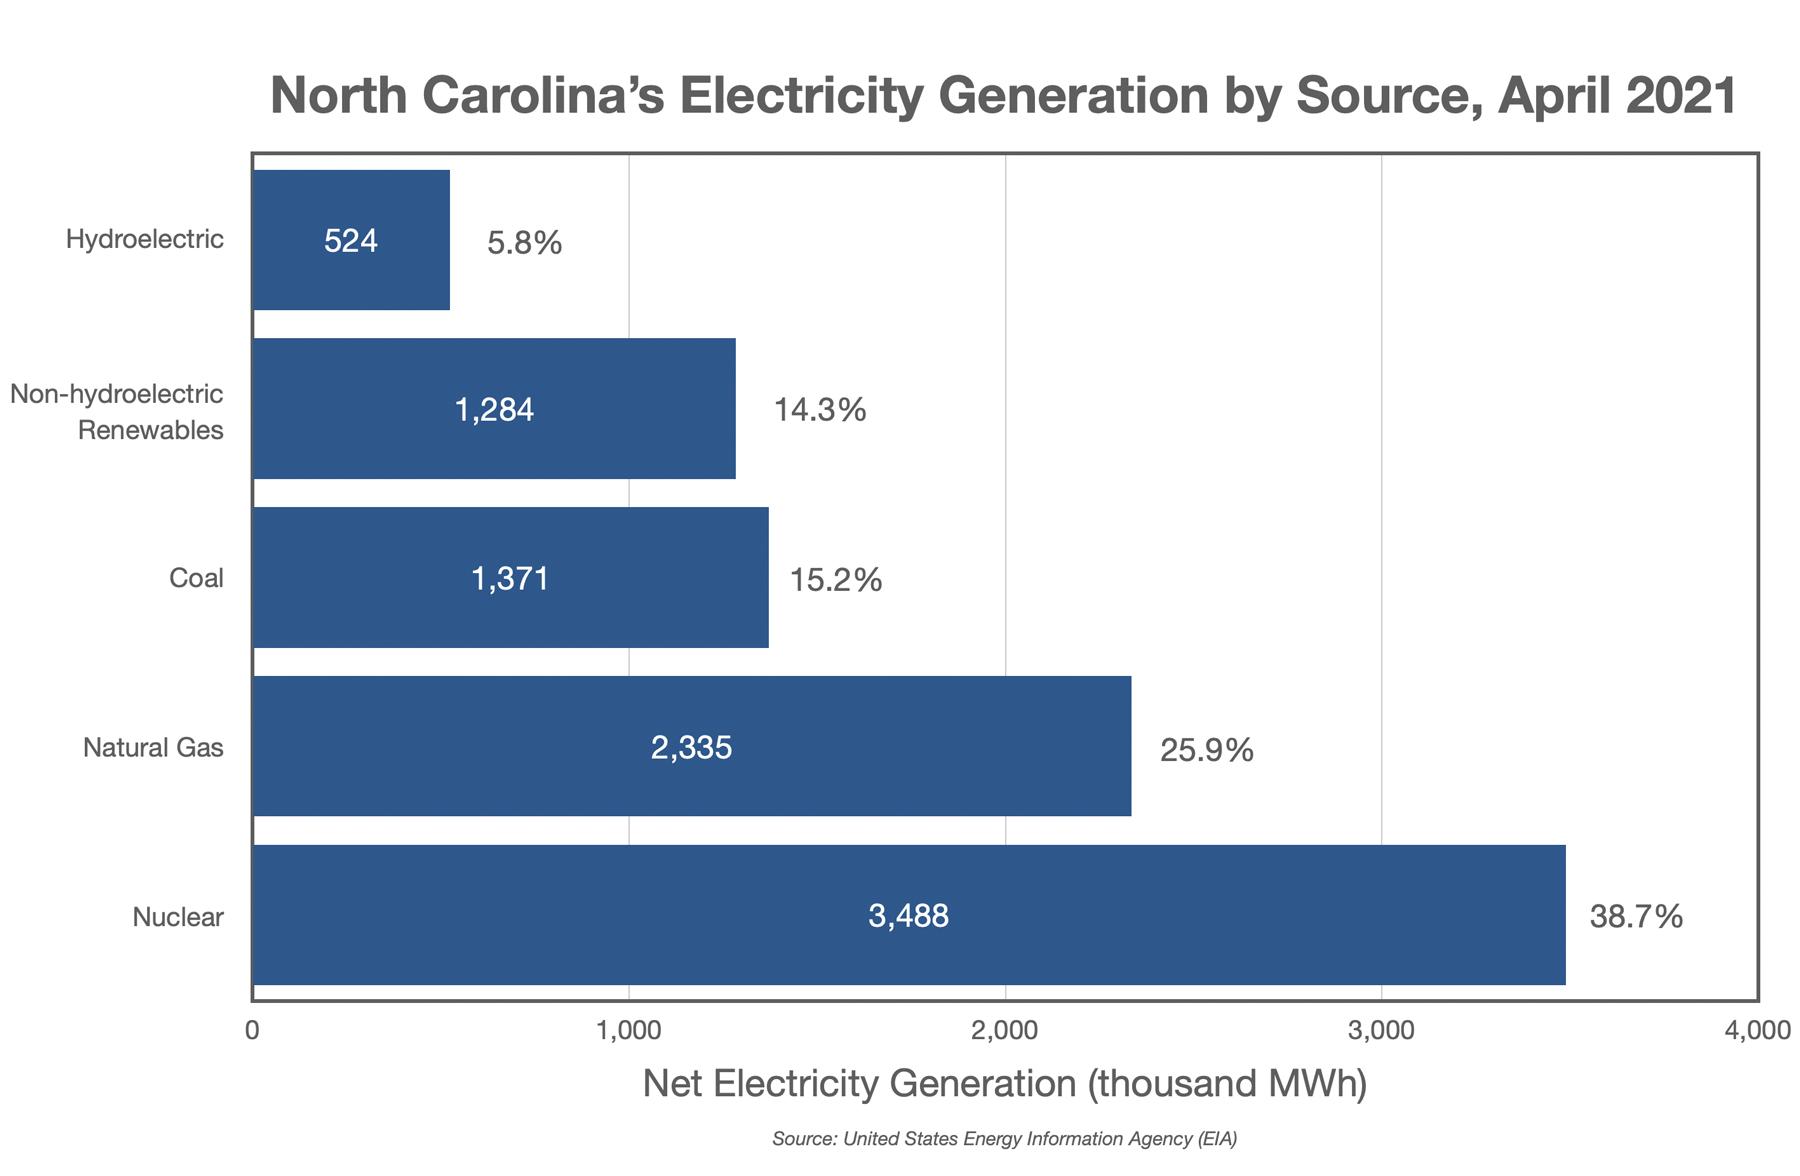 North Carolina's Electricity Generation by Source, April 2021